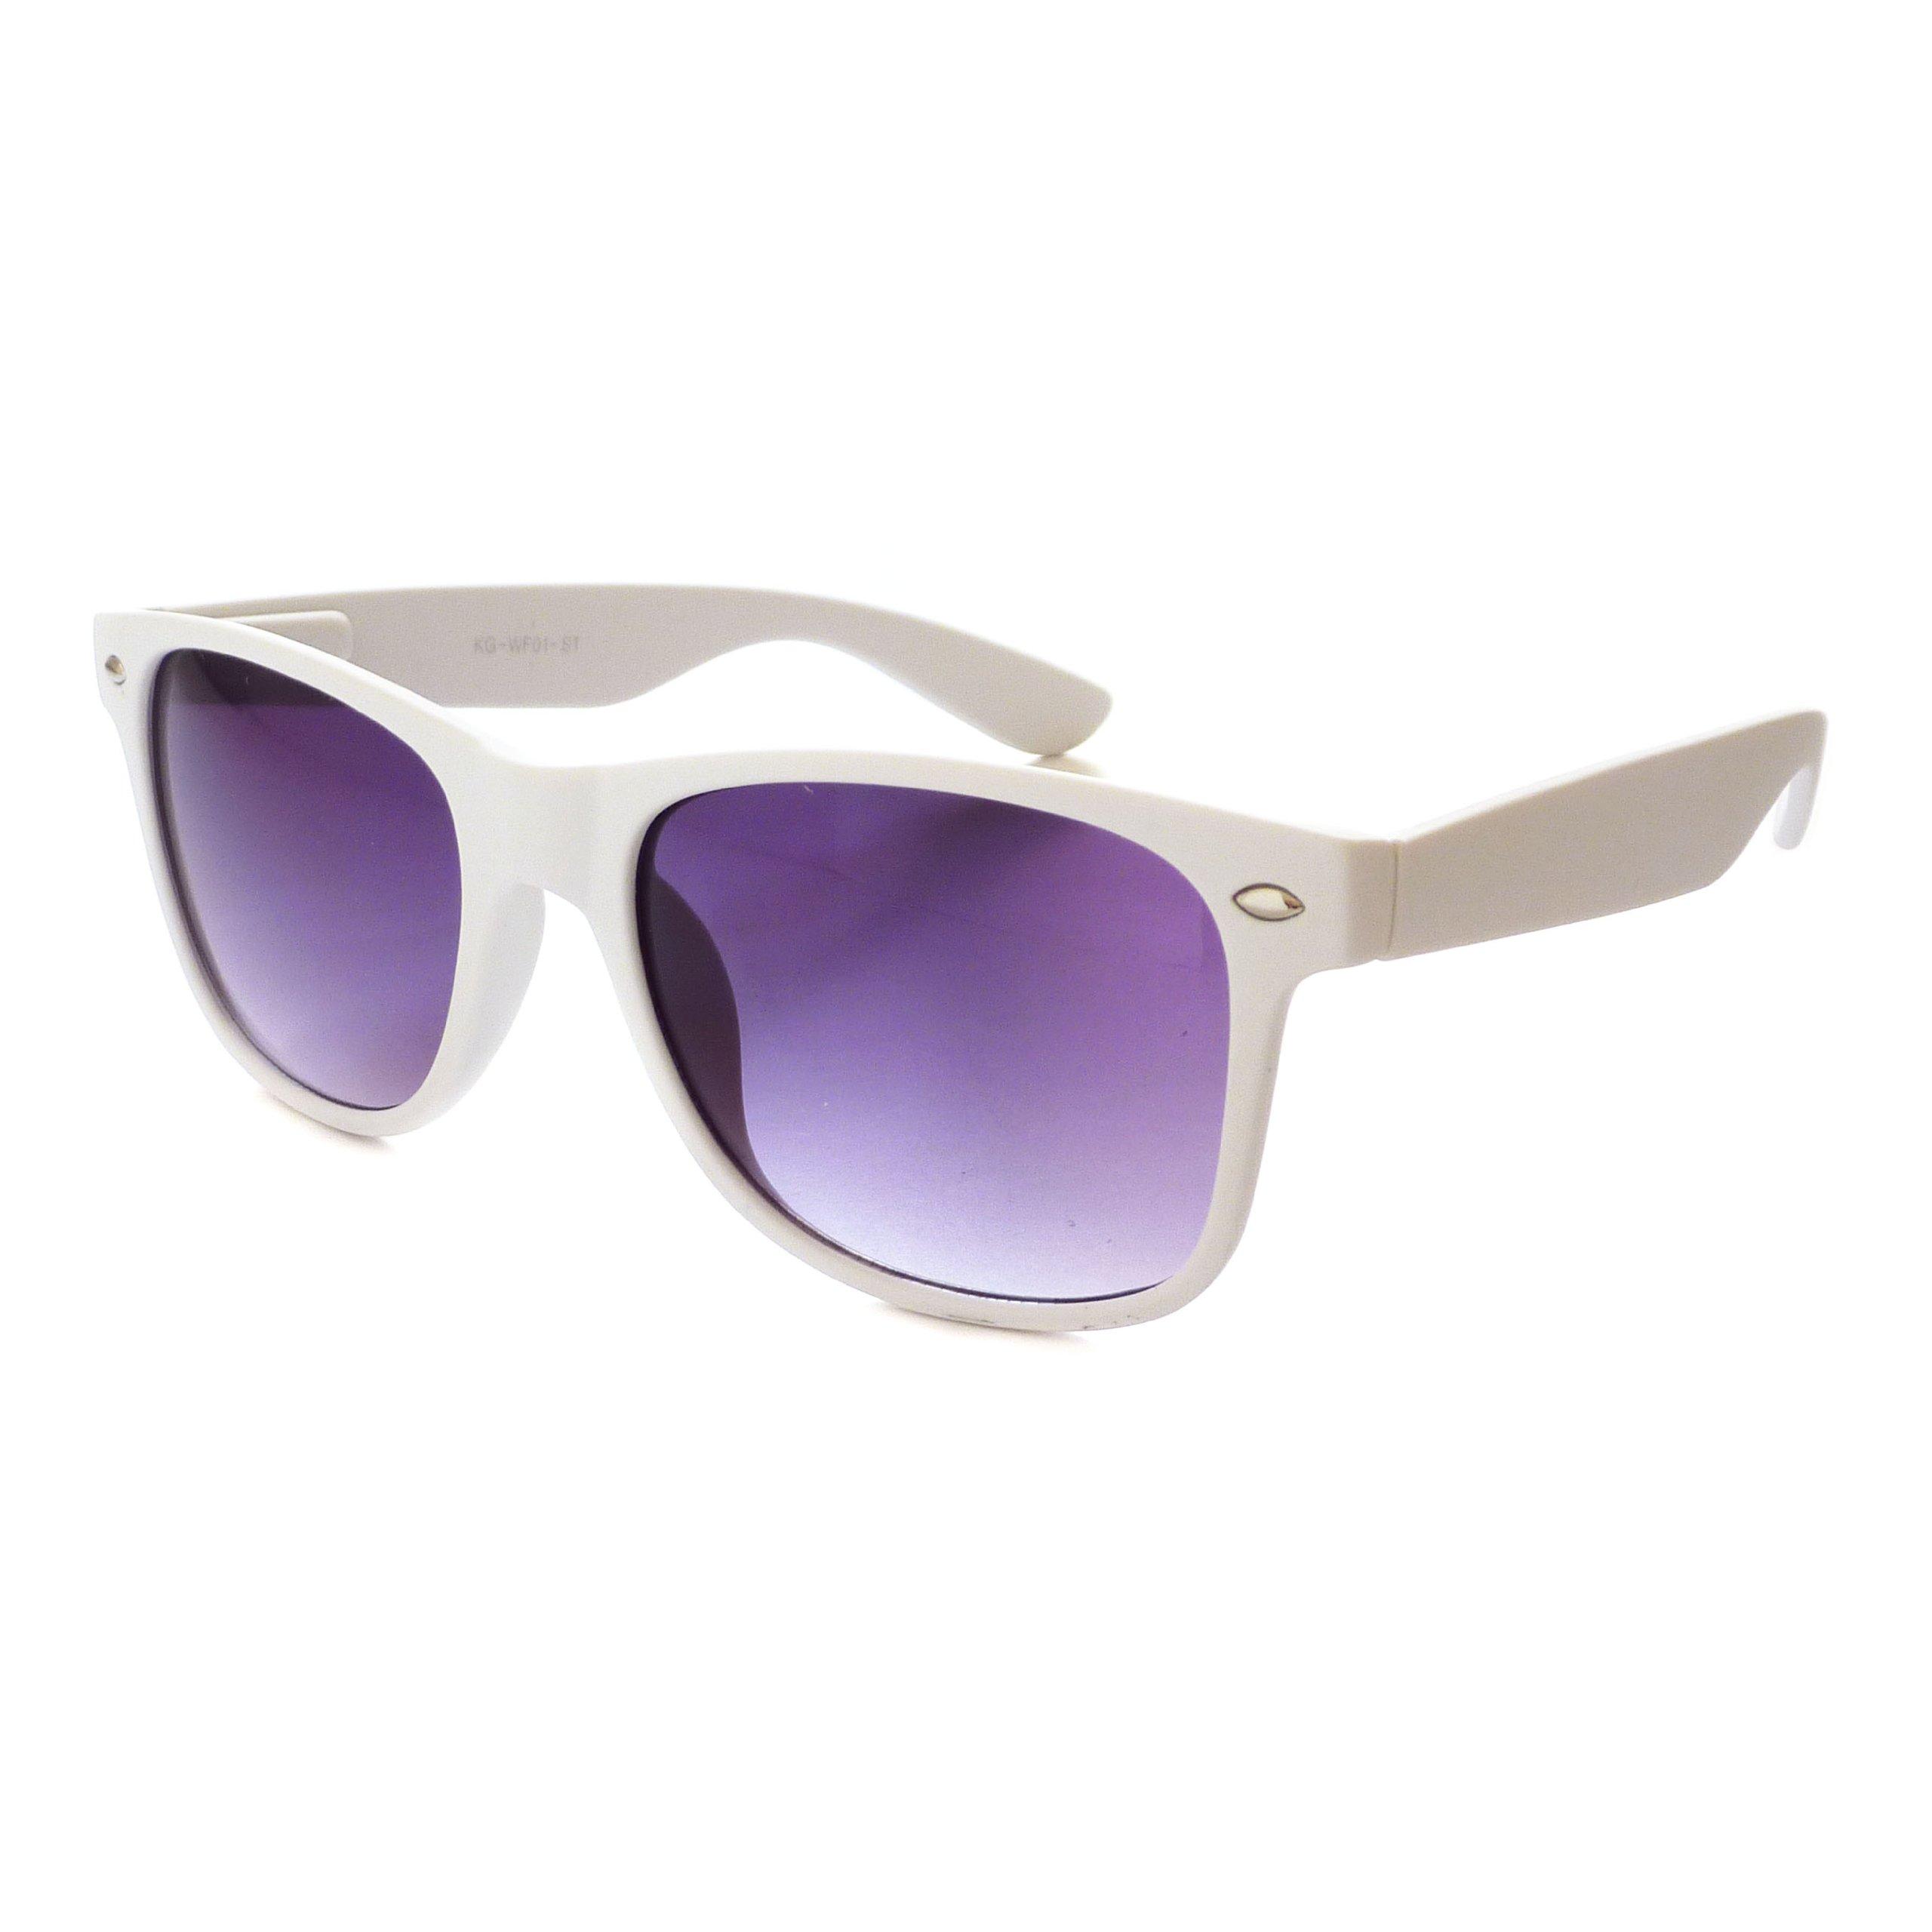 KIDS Childrens CUTE Matte Trendy Sunglasses Age 3-10 WHITE